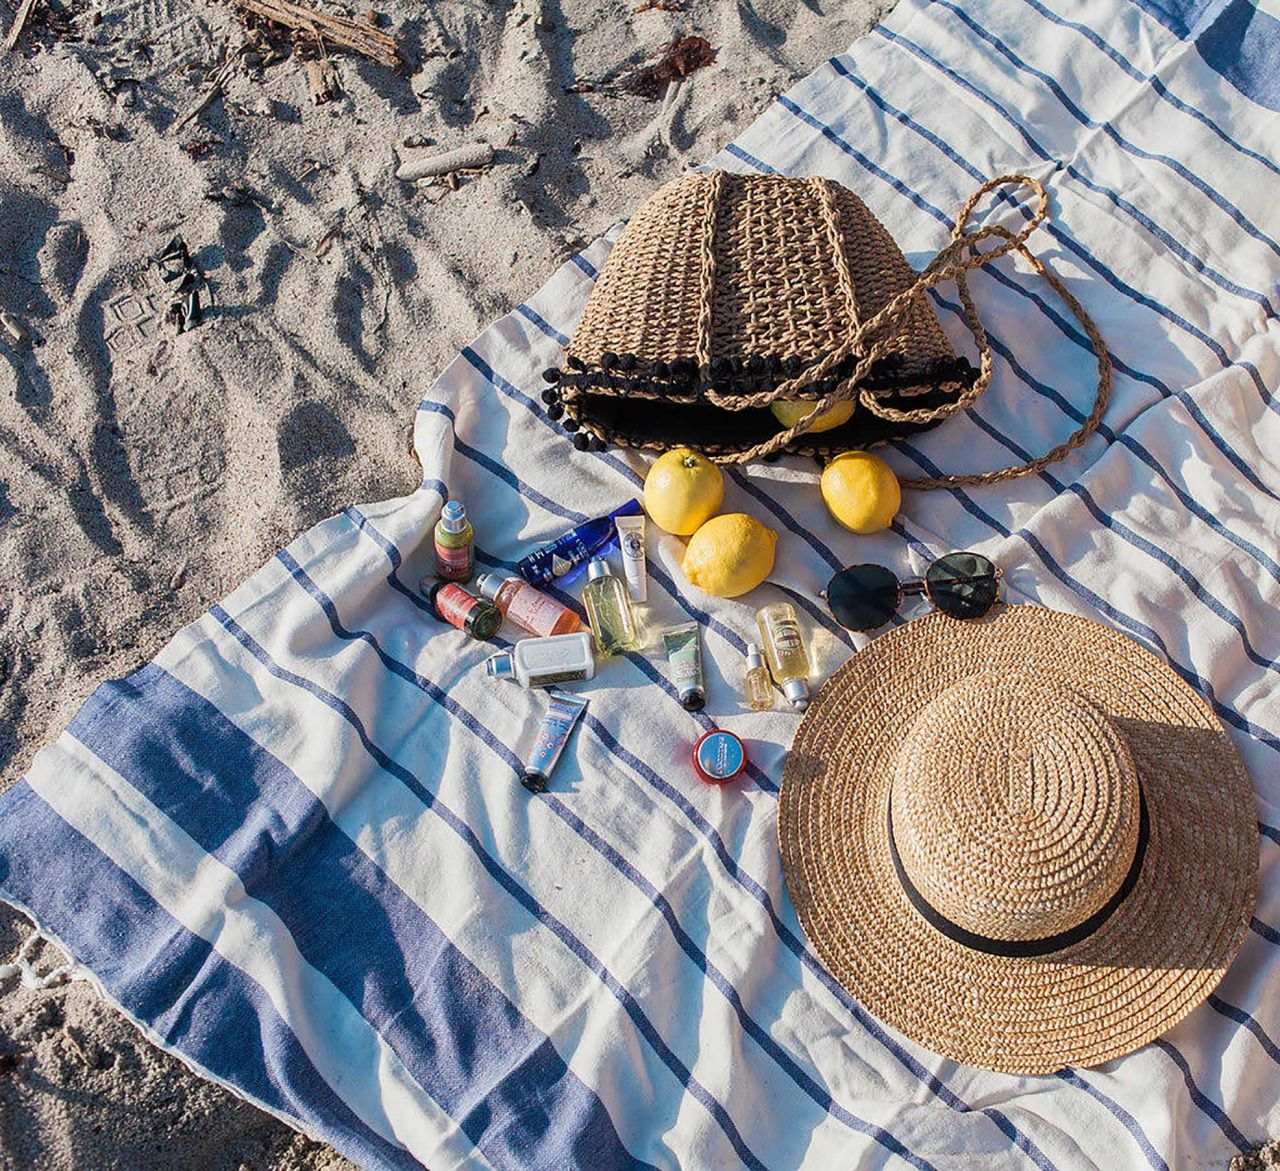 TRAVEL BEAUTY MUST HAVE- L'OCCITANE SUMMER TREASURES SET